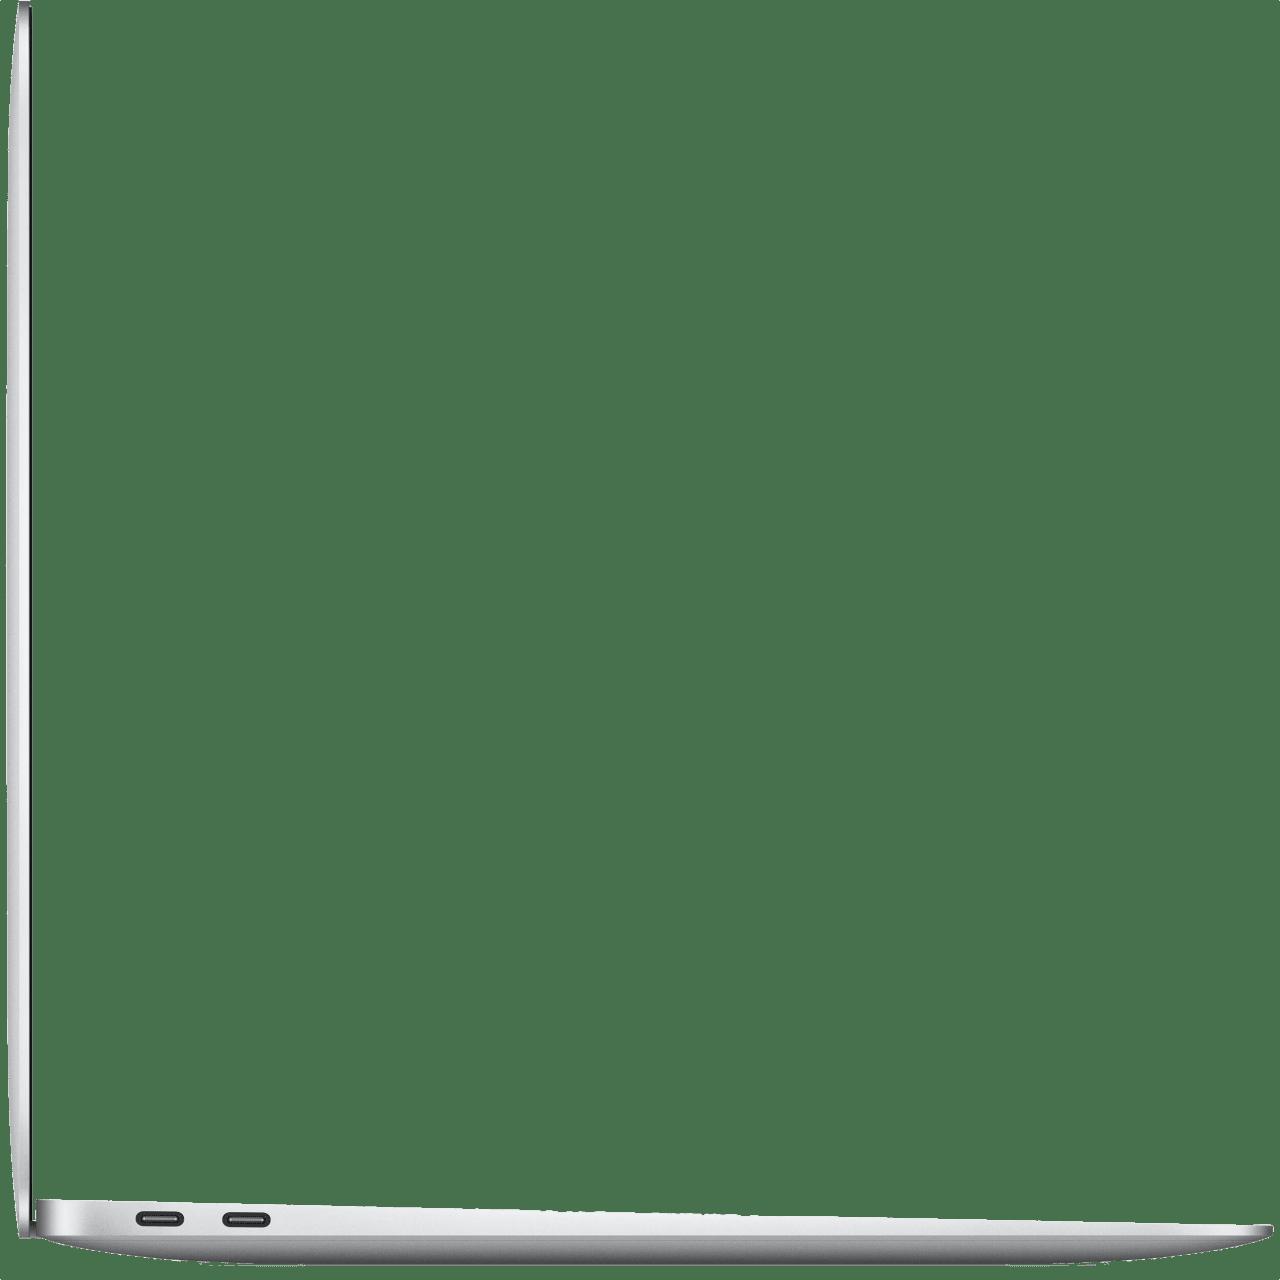 Silver Apple MacBook Air (Late 2020) - Laptop - Apple M1 - 8GB Memory - 256GB SSD.3